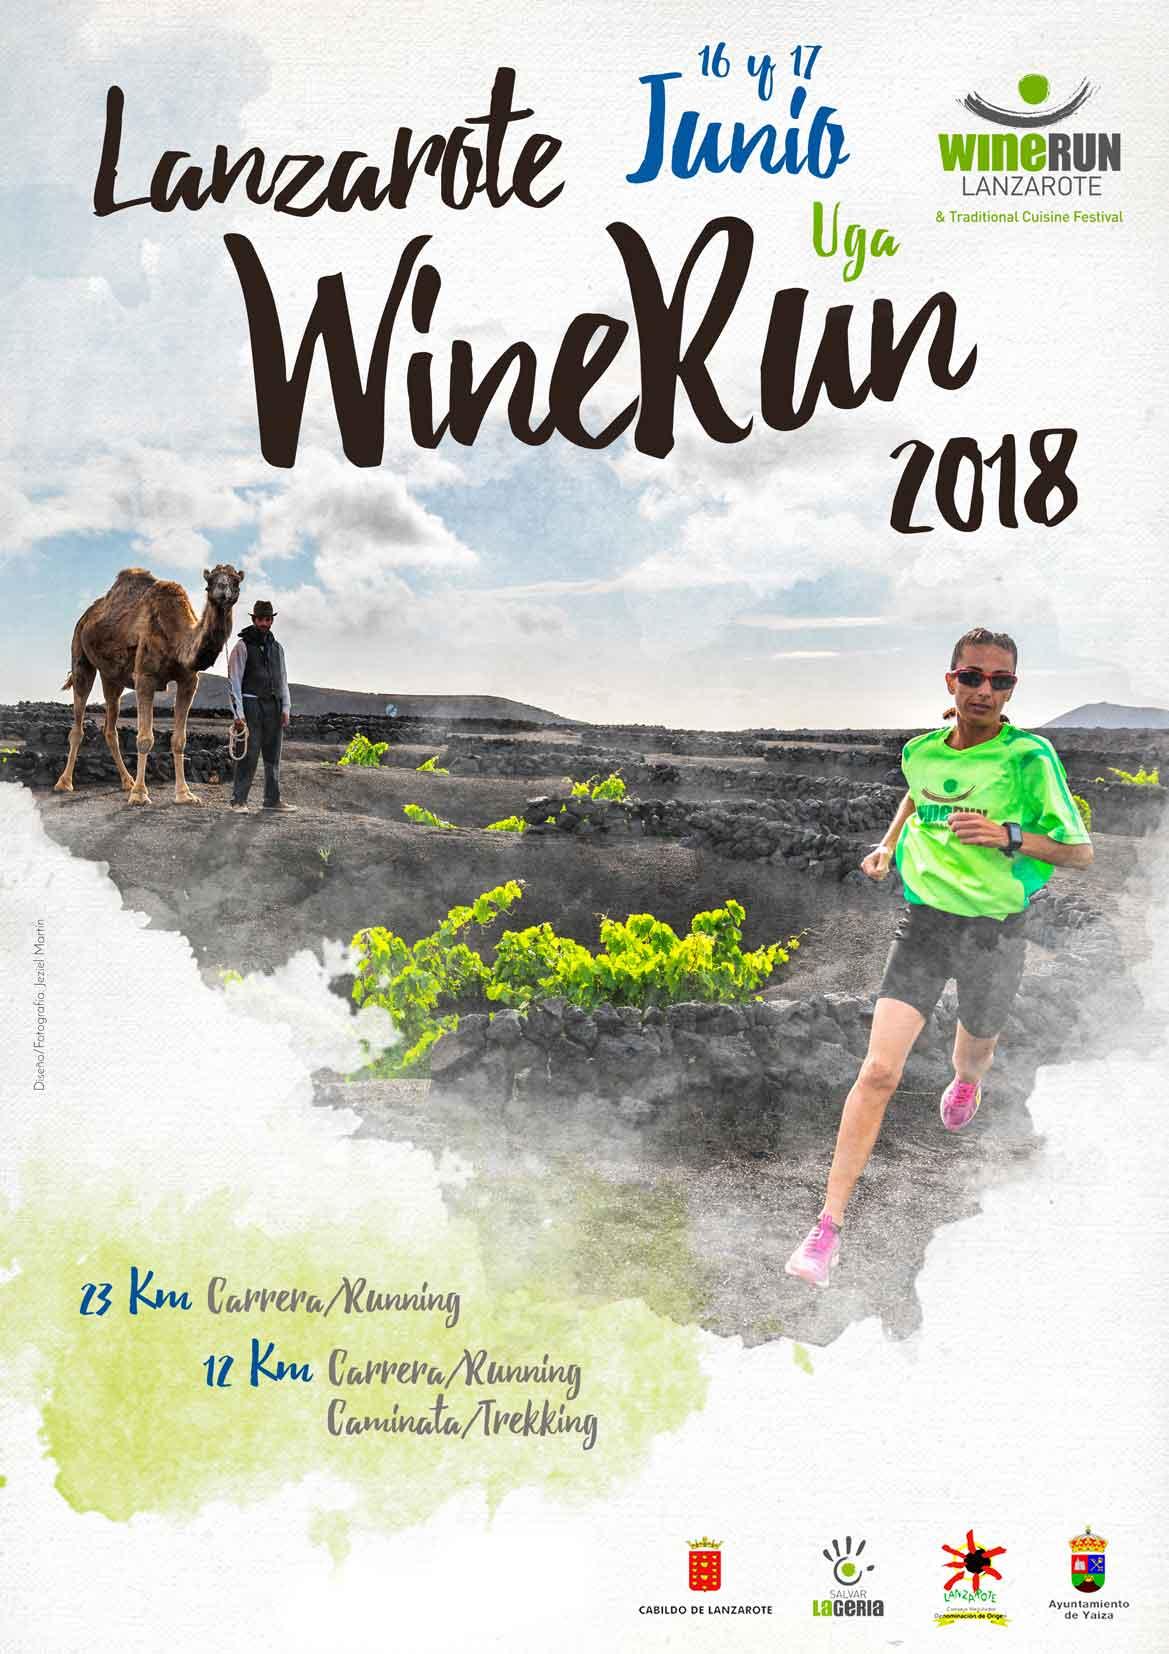 Wine Run Lanzarote 2018